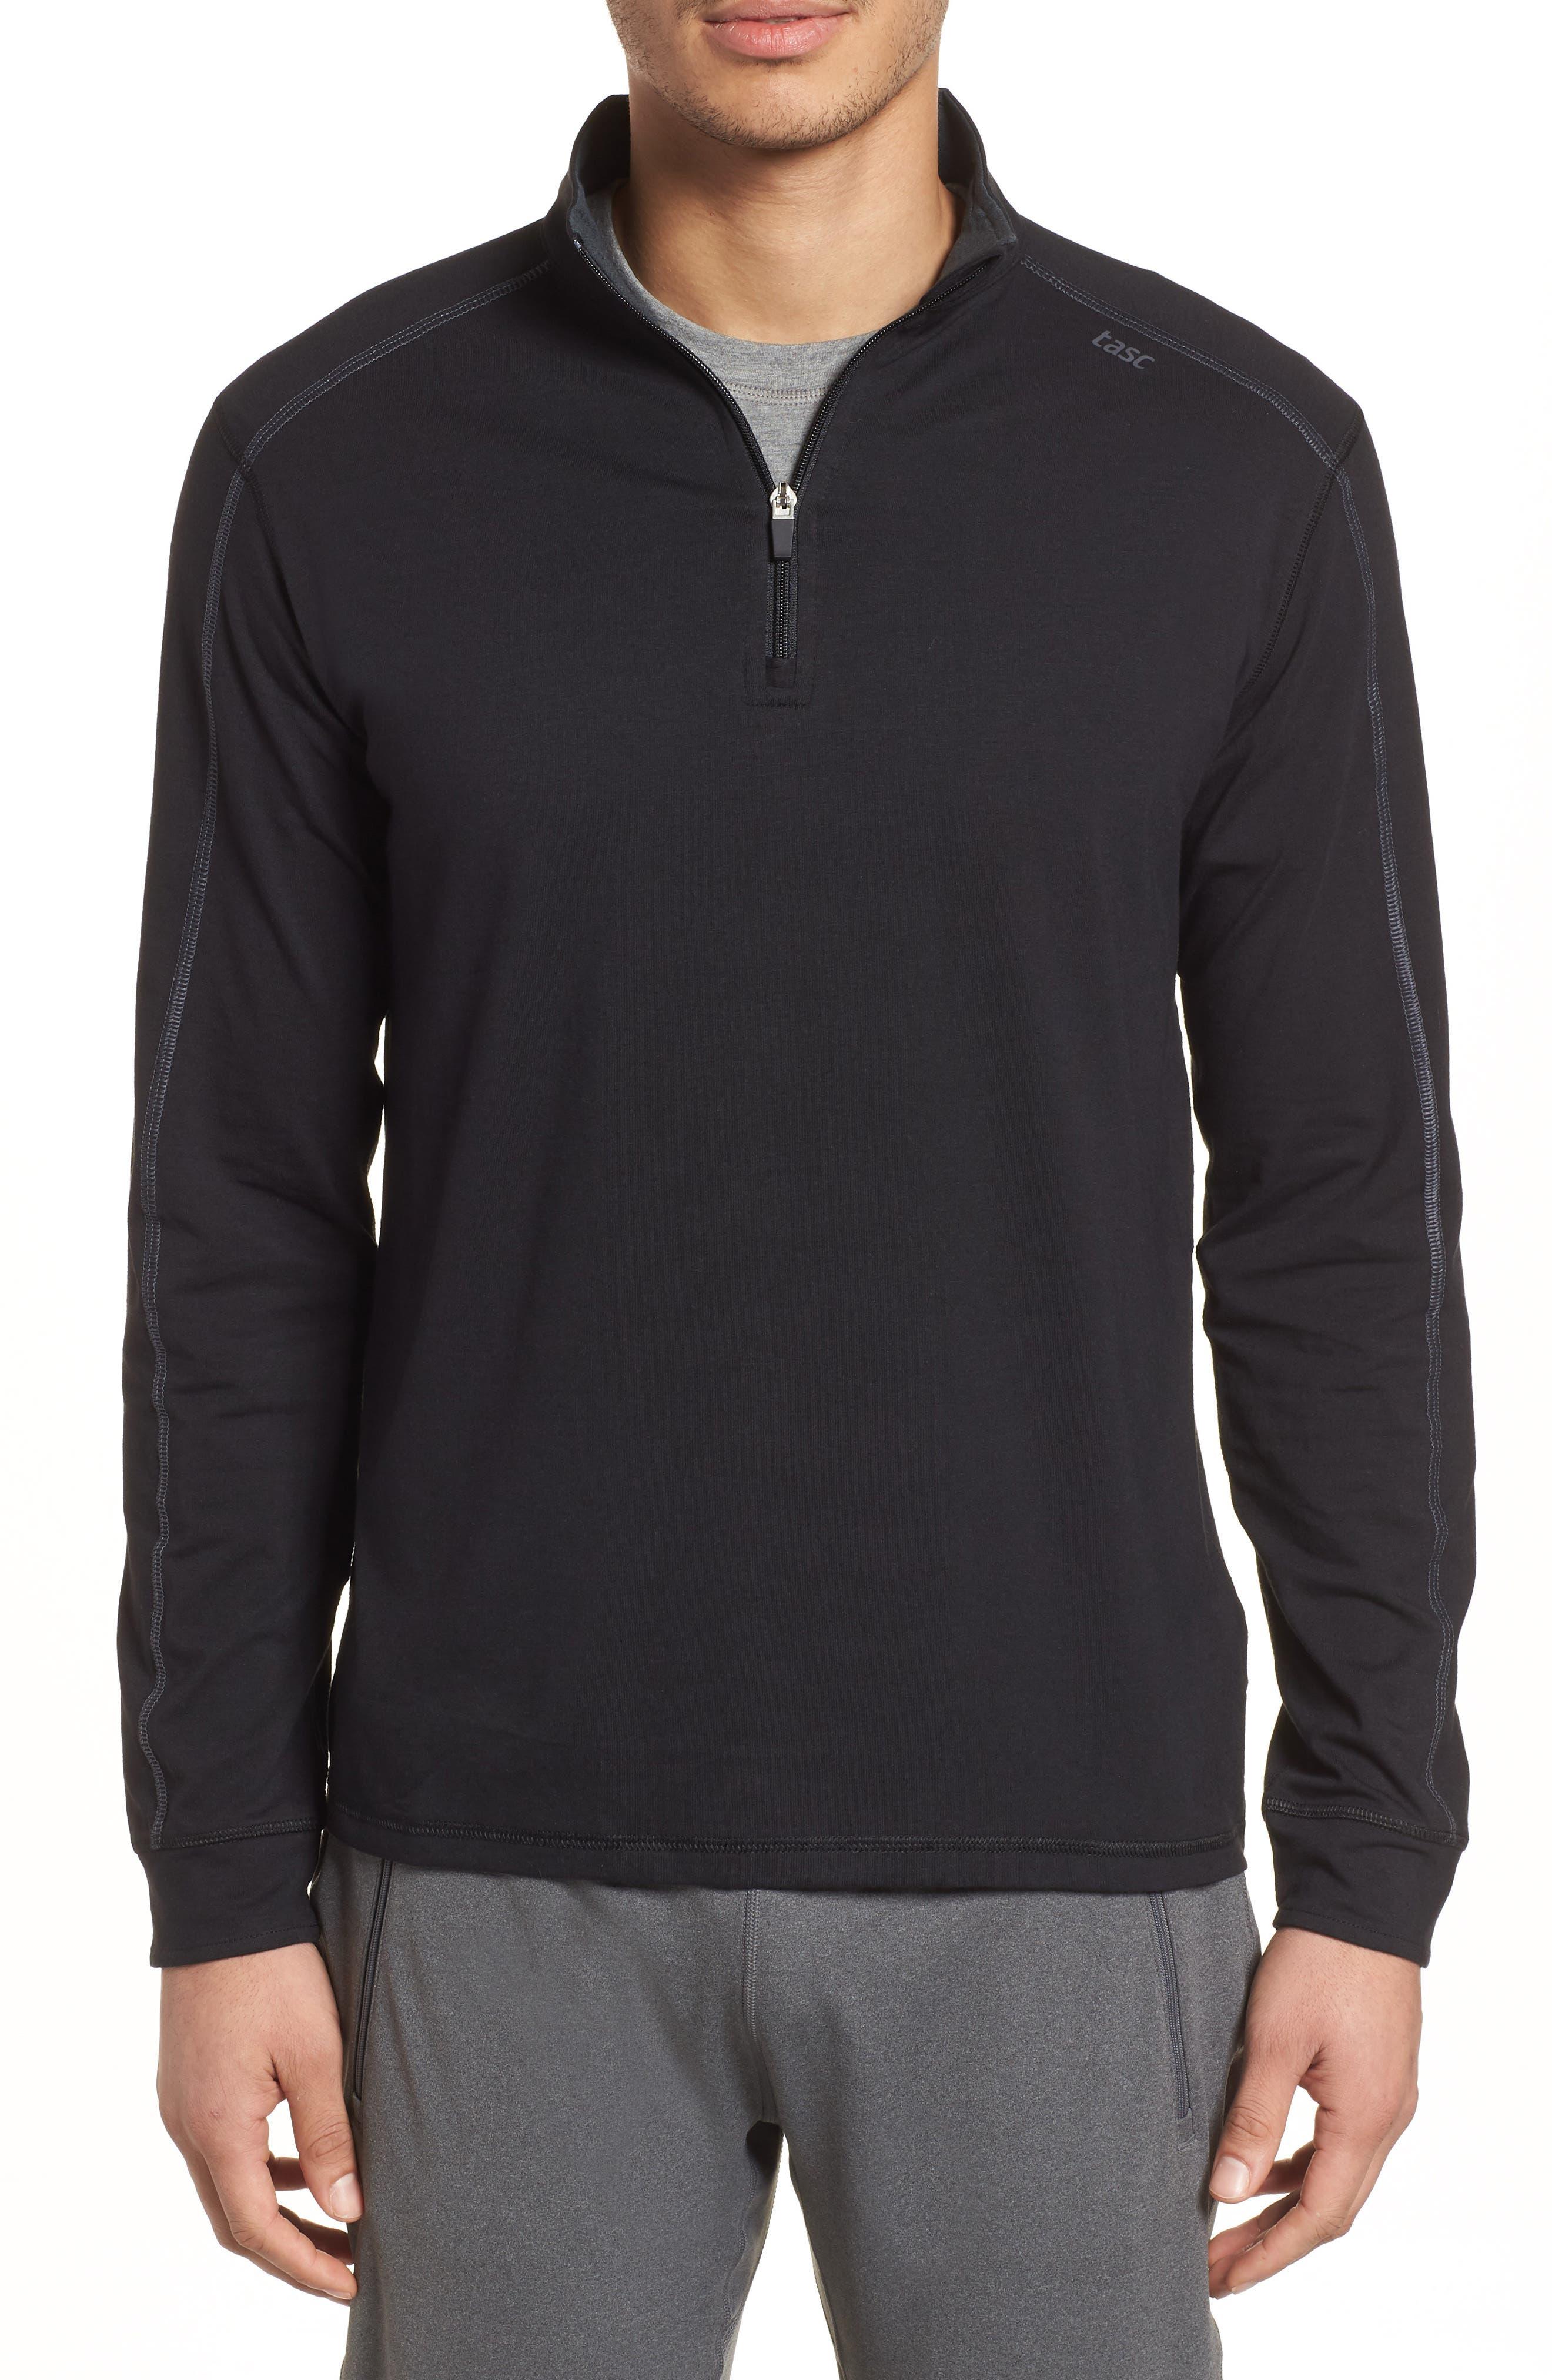 Carrollton Quarter Zip Sweatshirt,                         Main,                         color, BLACK/ GUNMETAL